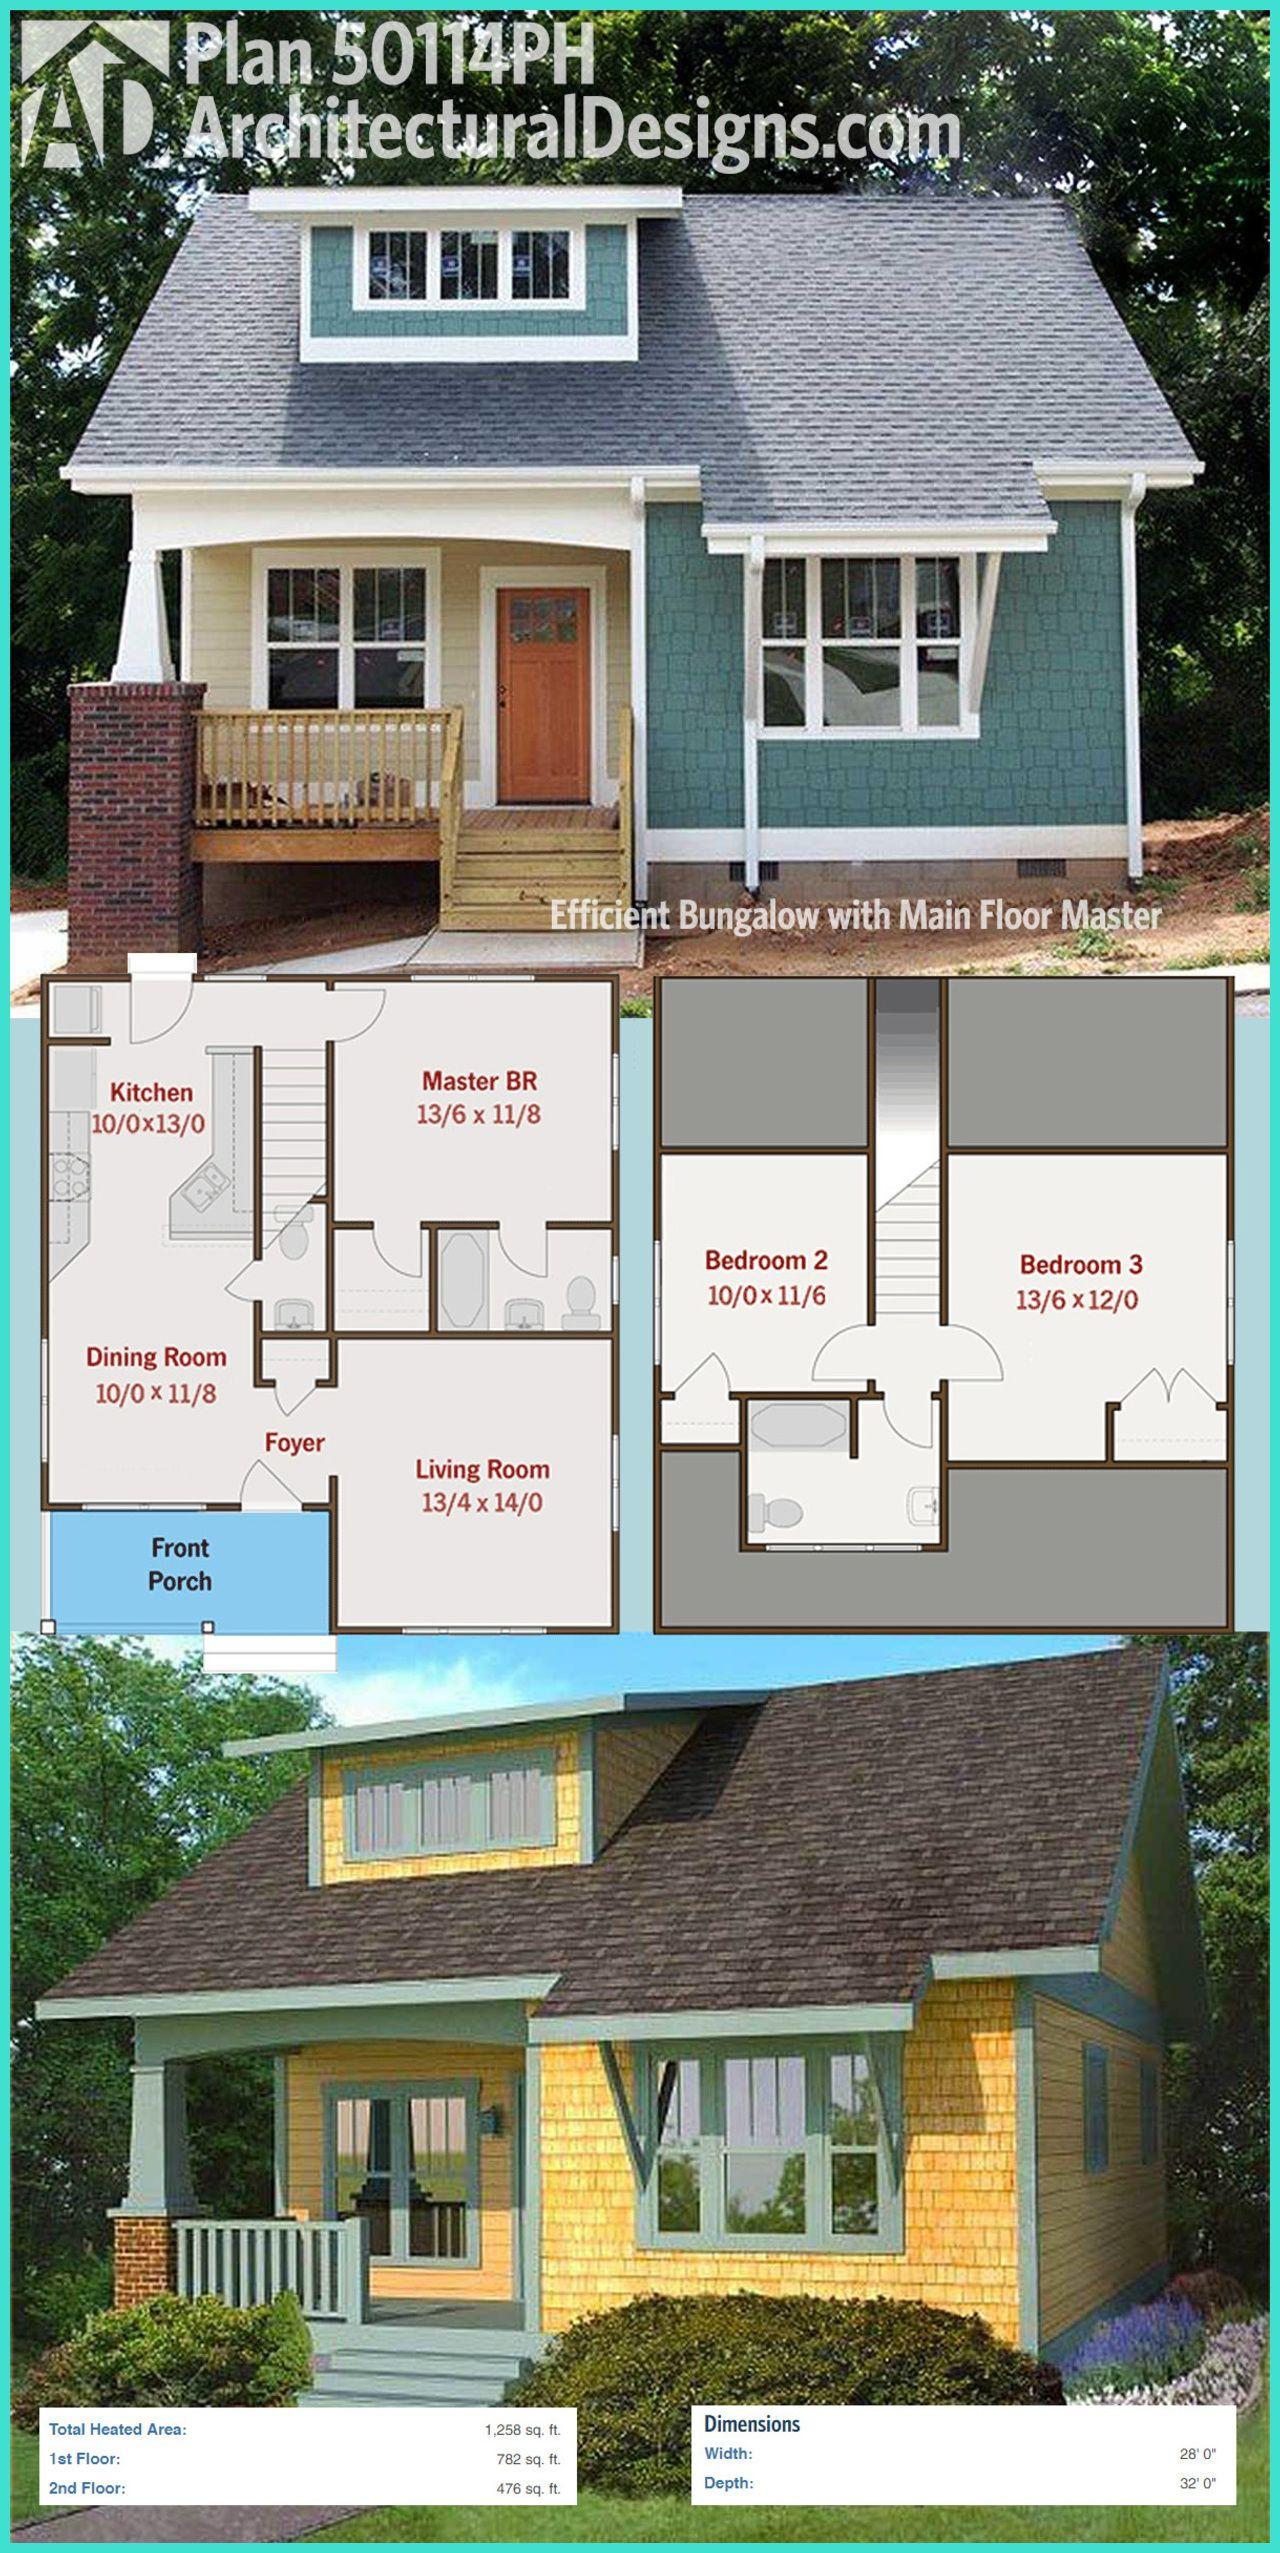 How To Design Home Kitchens Diy Room Ideas Craftsman House Plans Bungalow House Plans Basement House Plans